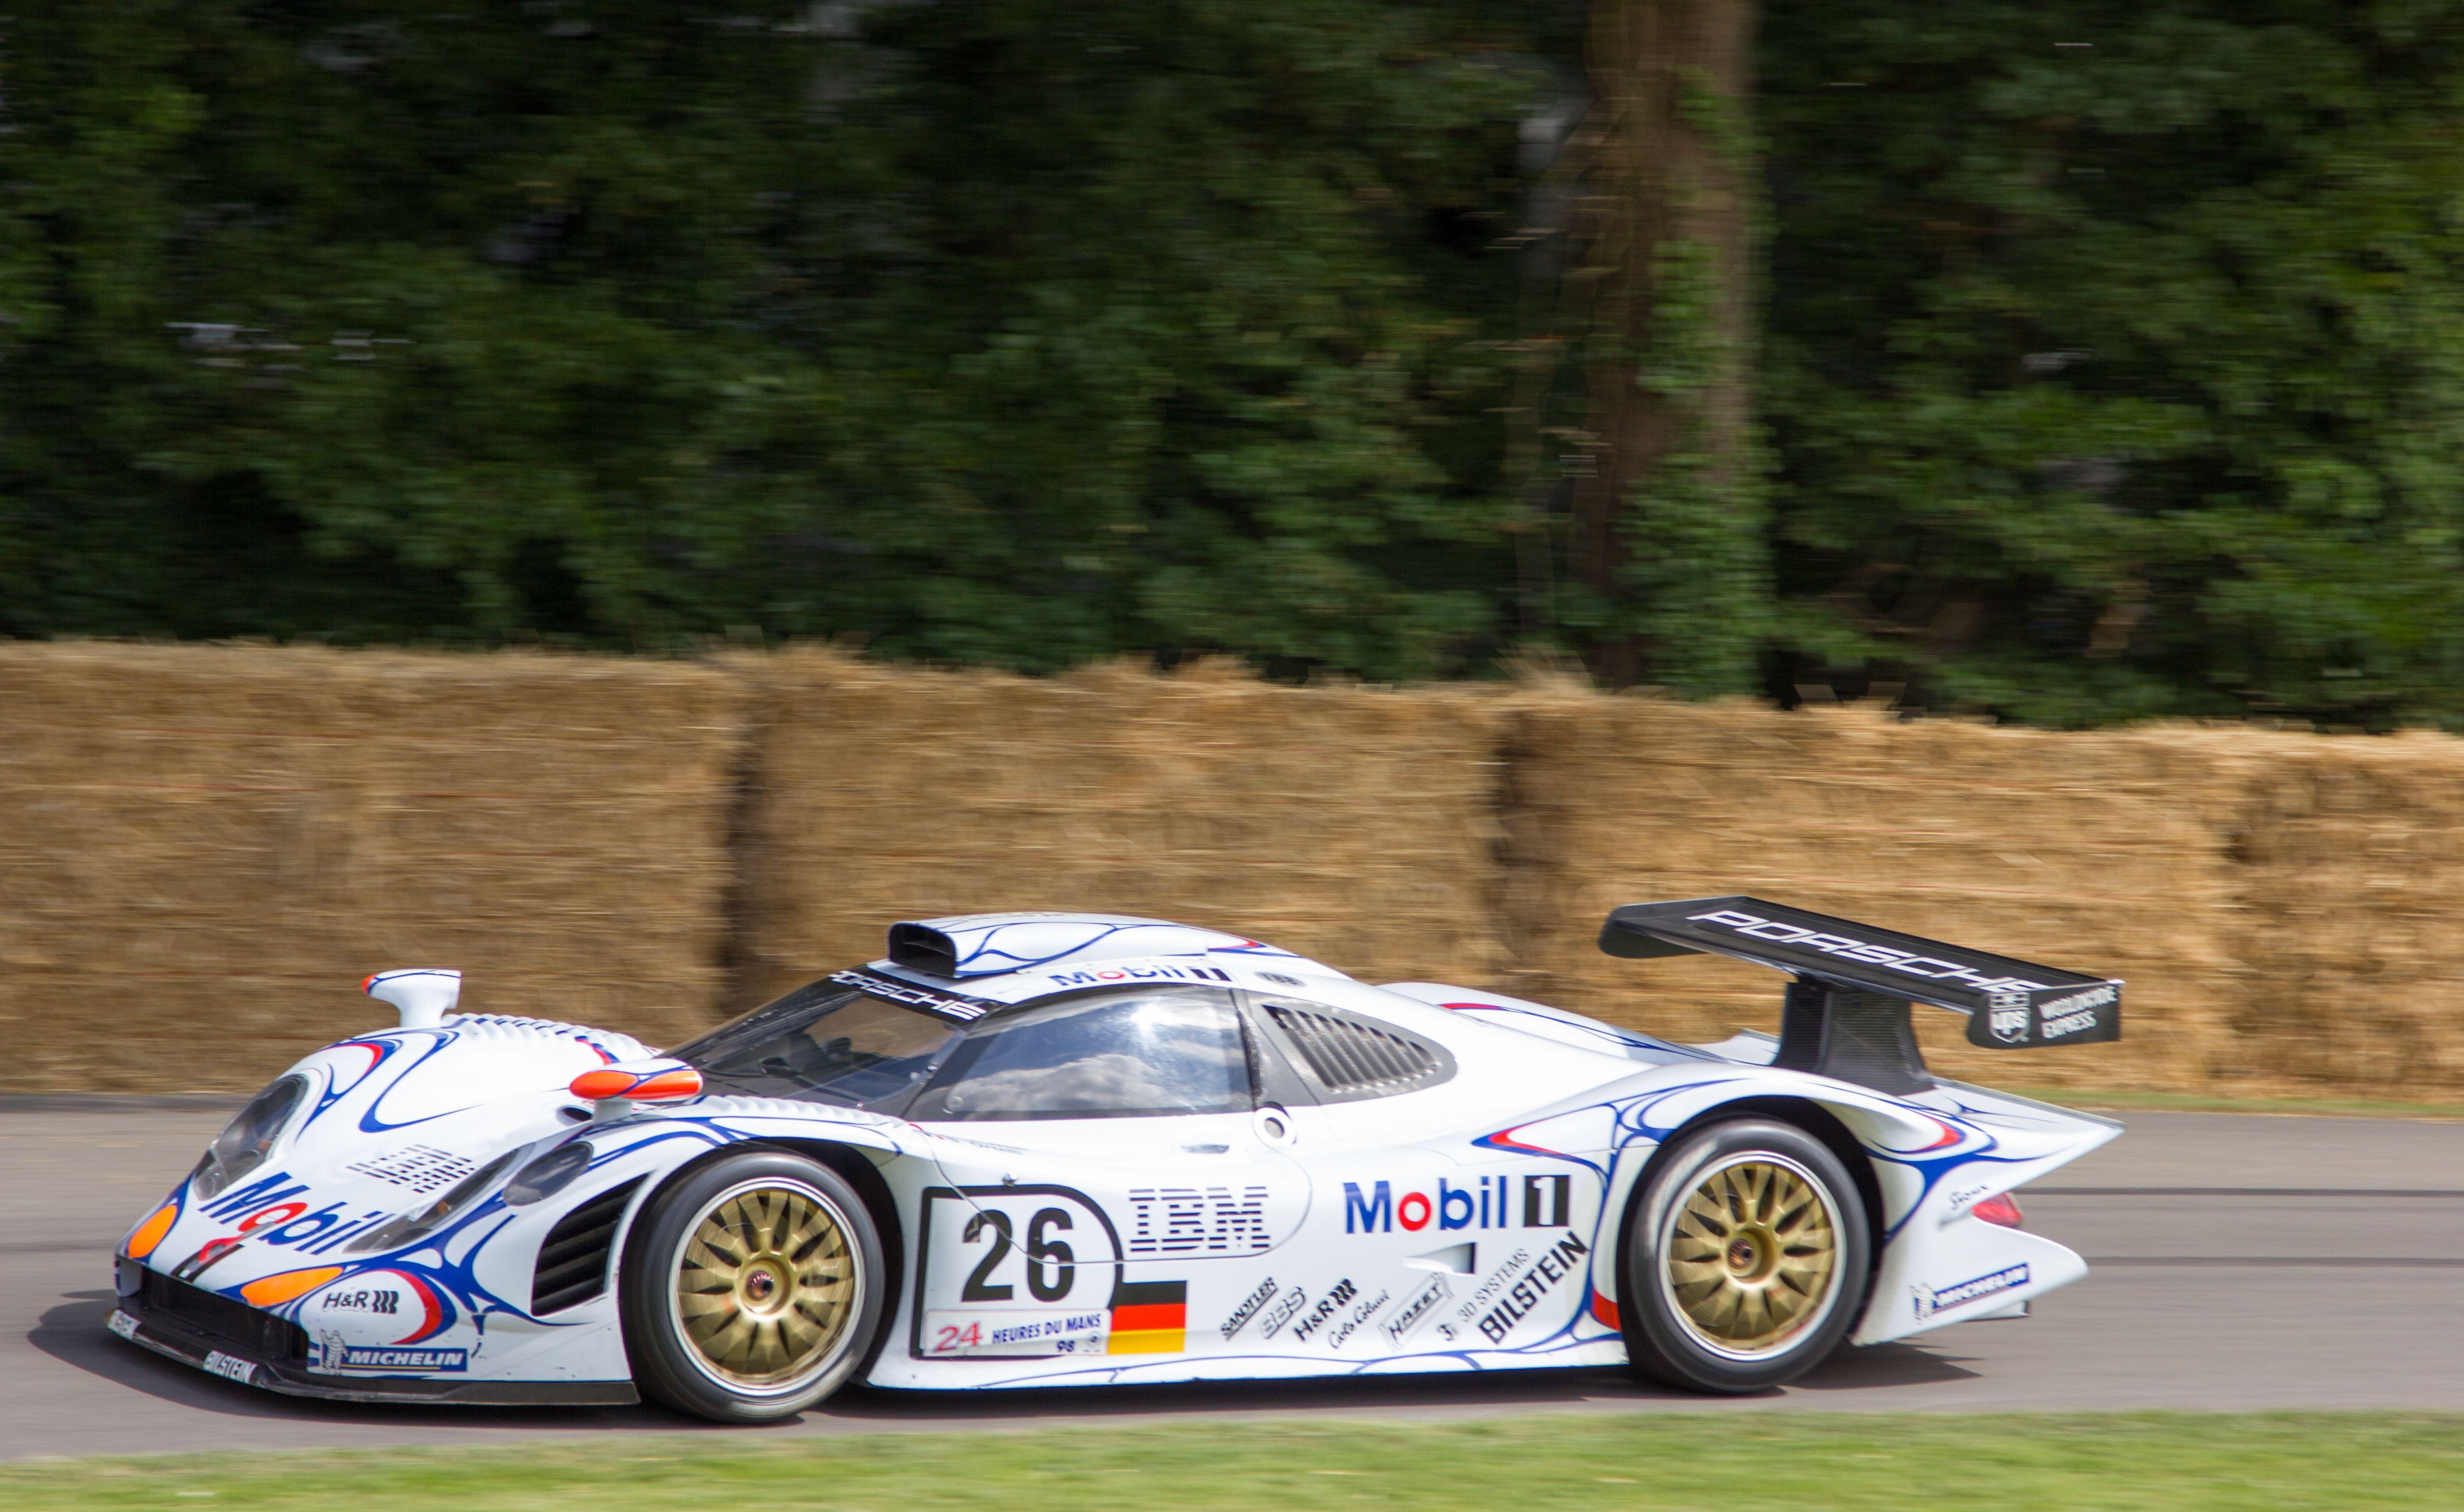 1dc8193edf203021e9ab6a67d305aea0 Inspiring Porsche 911 Gt1 Road atlanta Cars Trend